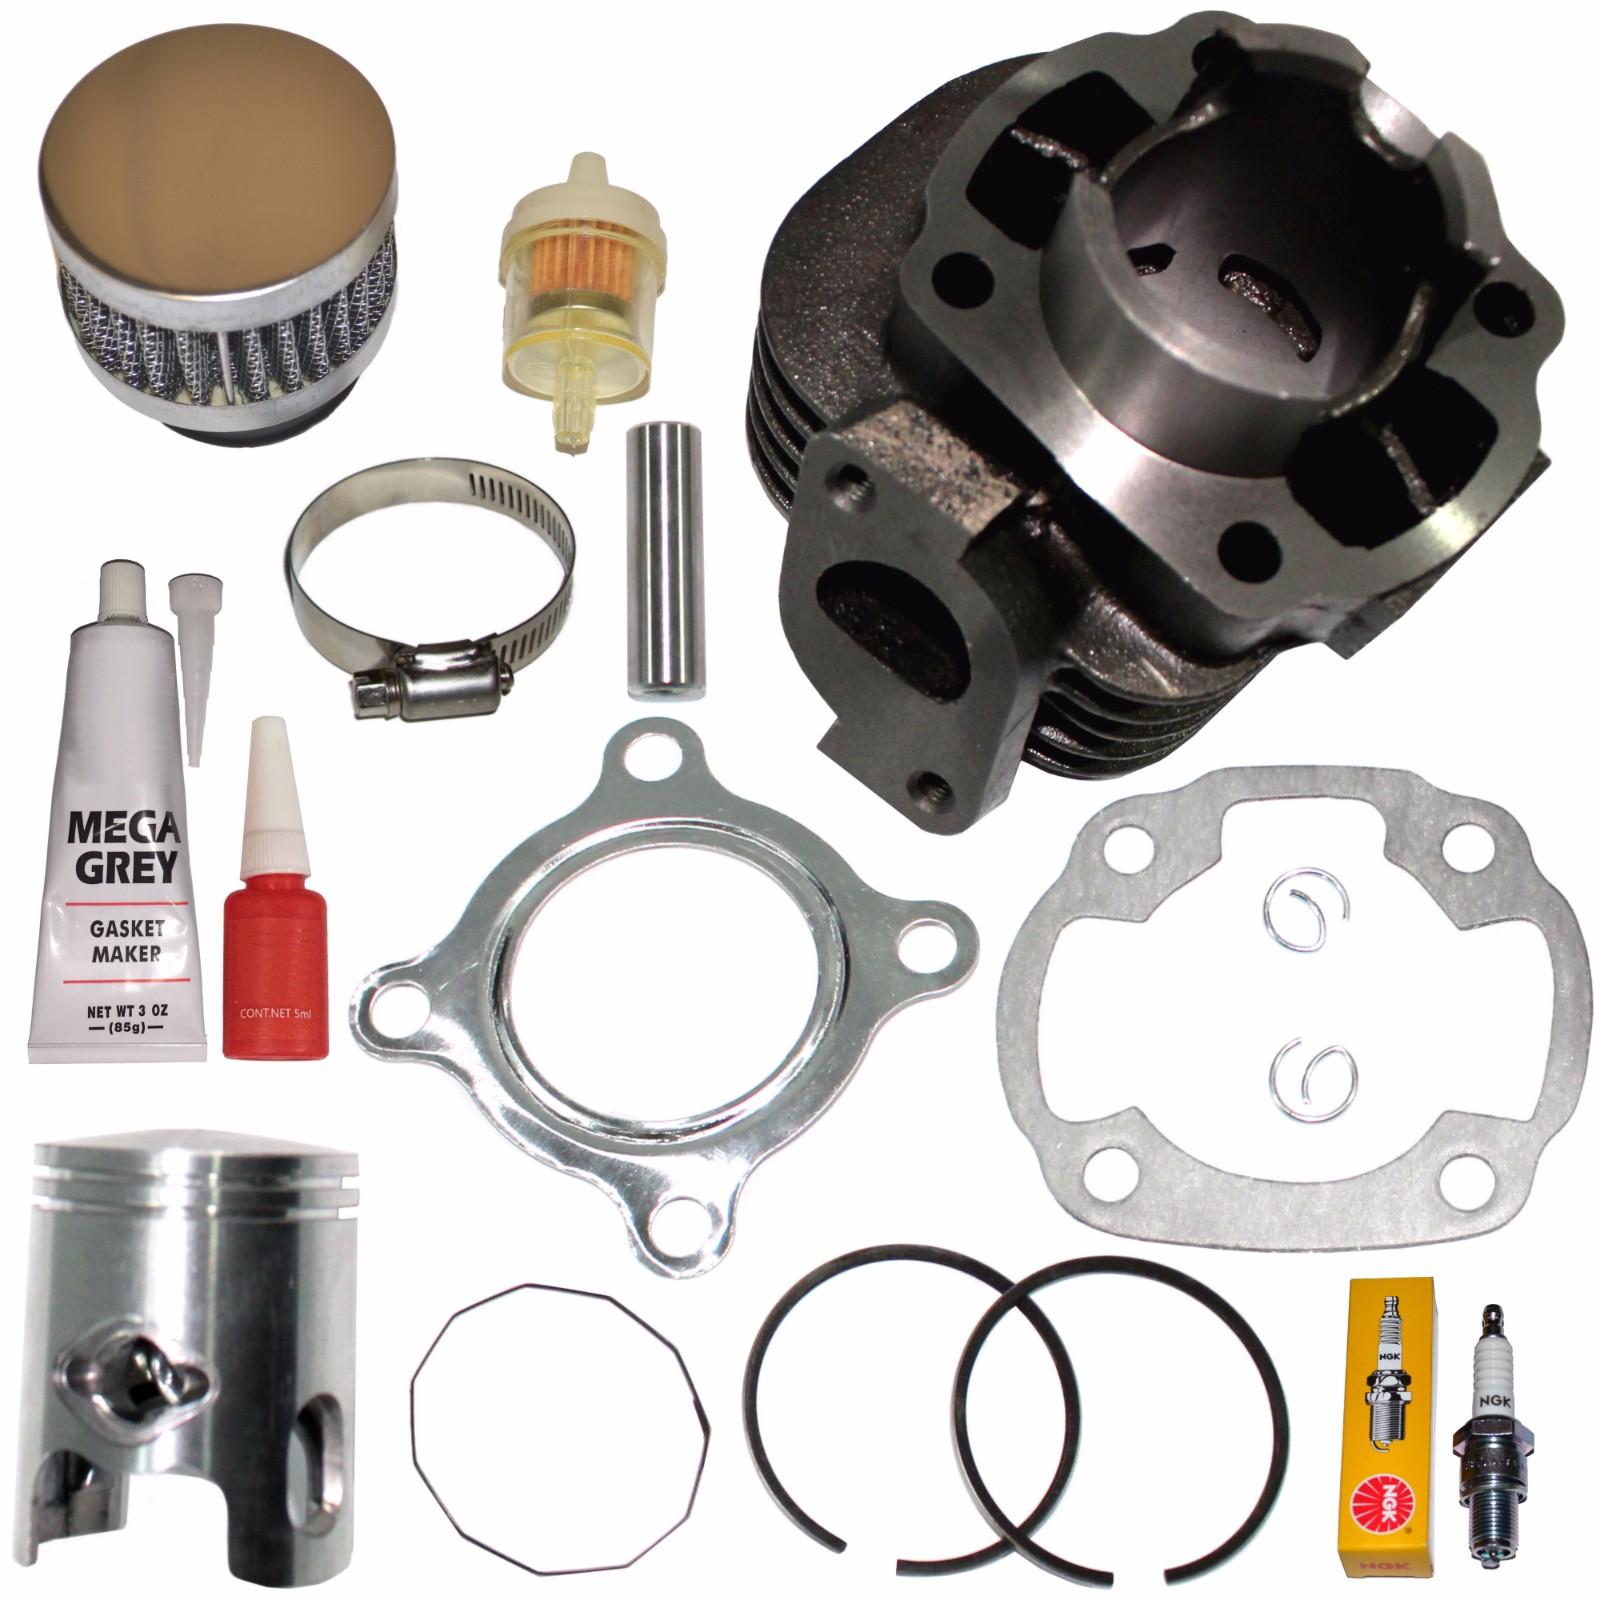 Top Notch Parts Yamaha Zuma Yw50 Yw 50 Piston Cylinder Piston Gaskets Top End Kit Set 2002-2011